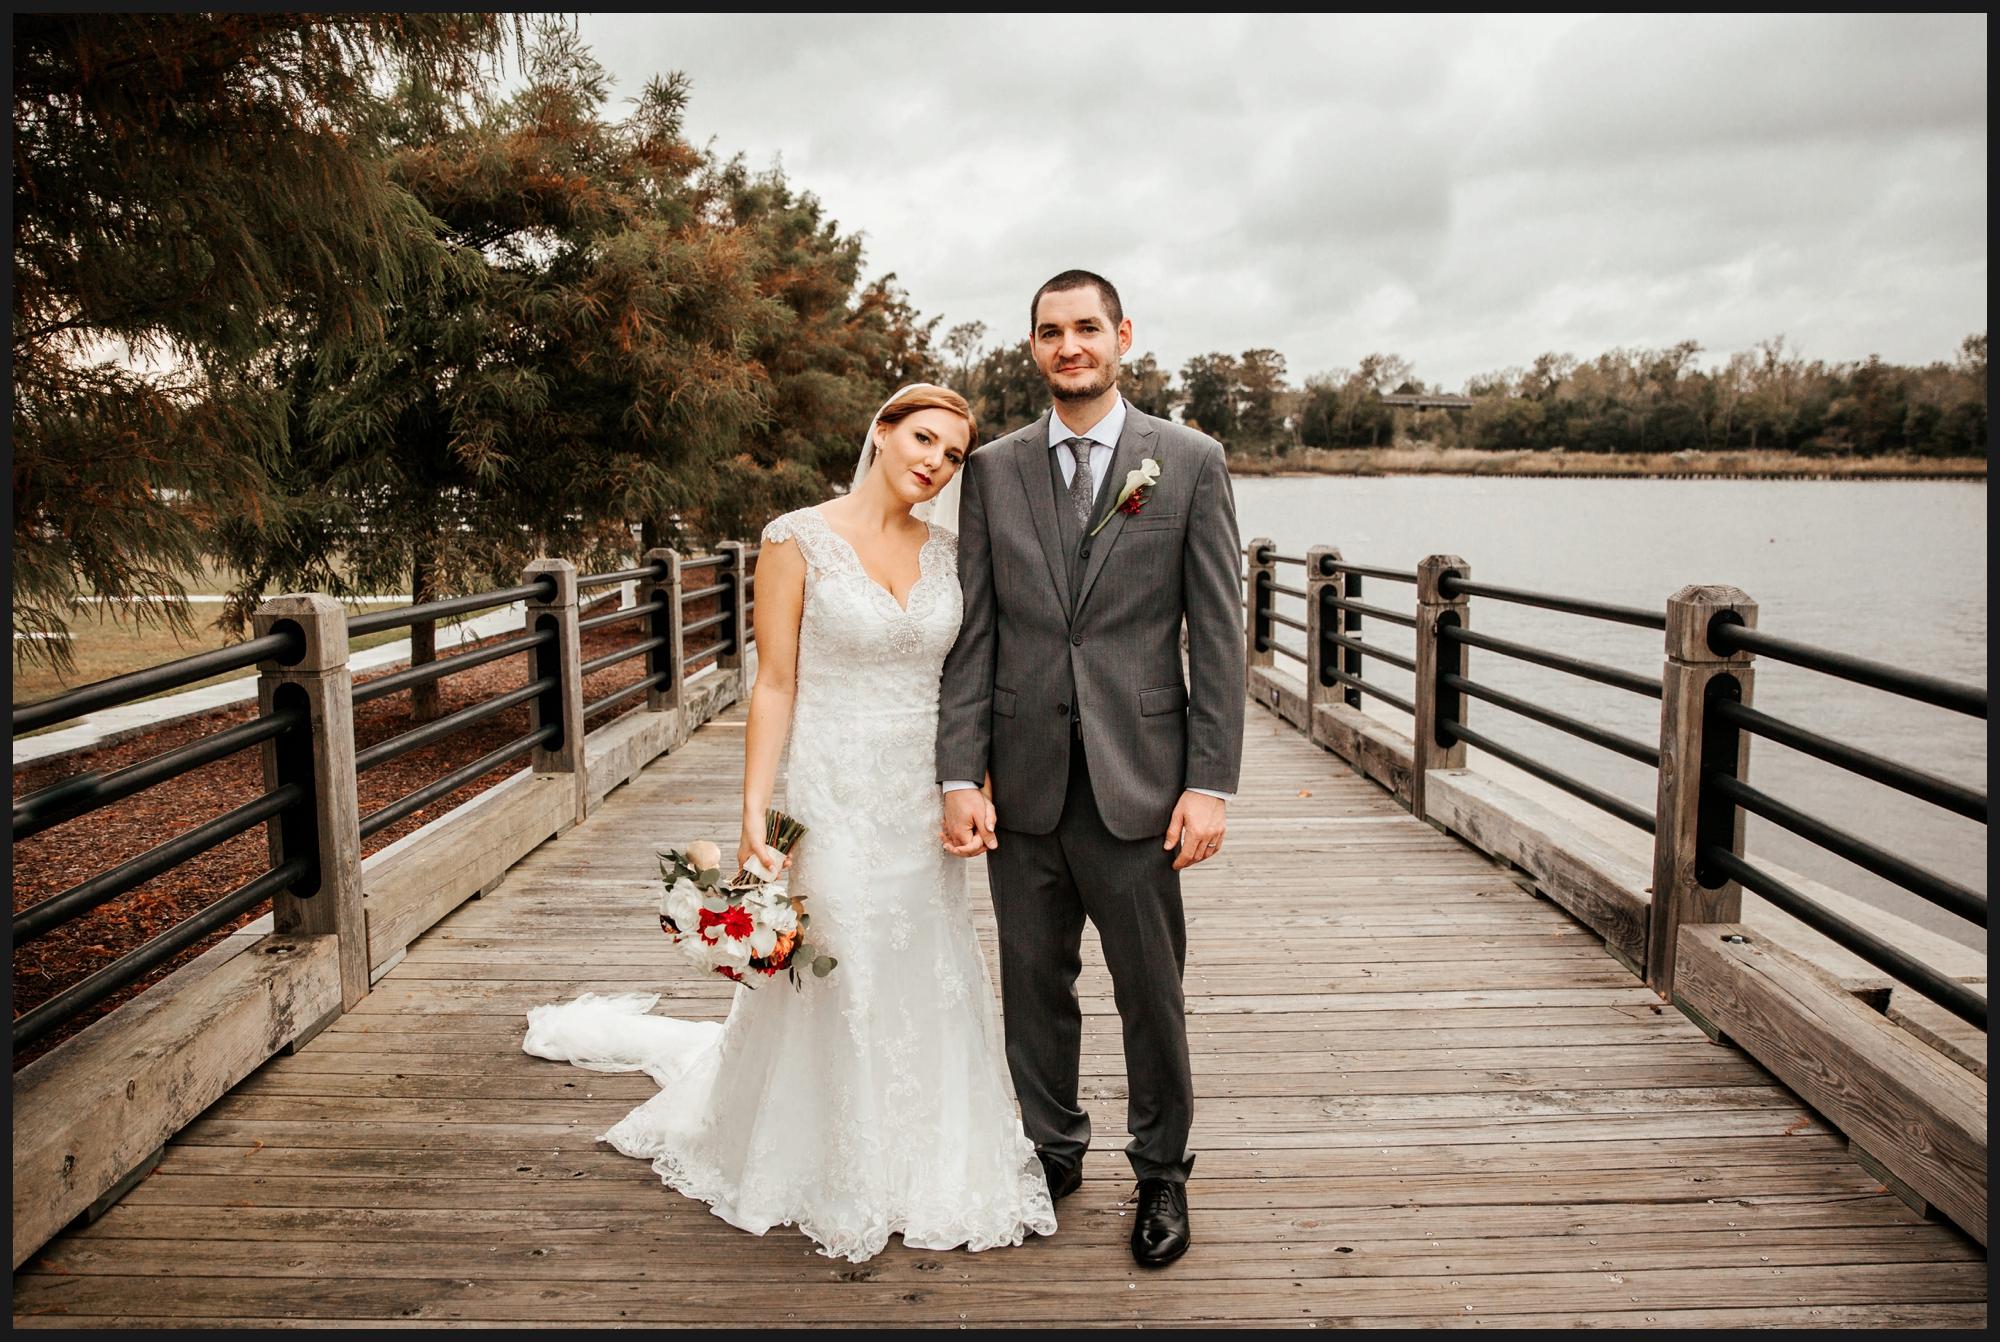 Orlando-Wedding-Photographer-destination-wedding-photographer-florida-wedding-photographer-bohemian-wedding-photographer_0640.jpg